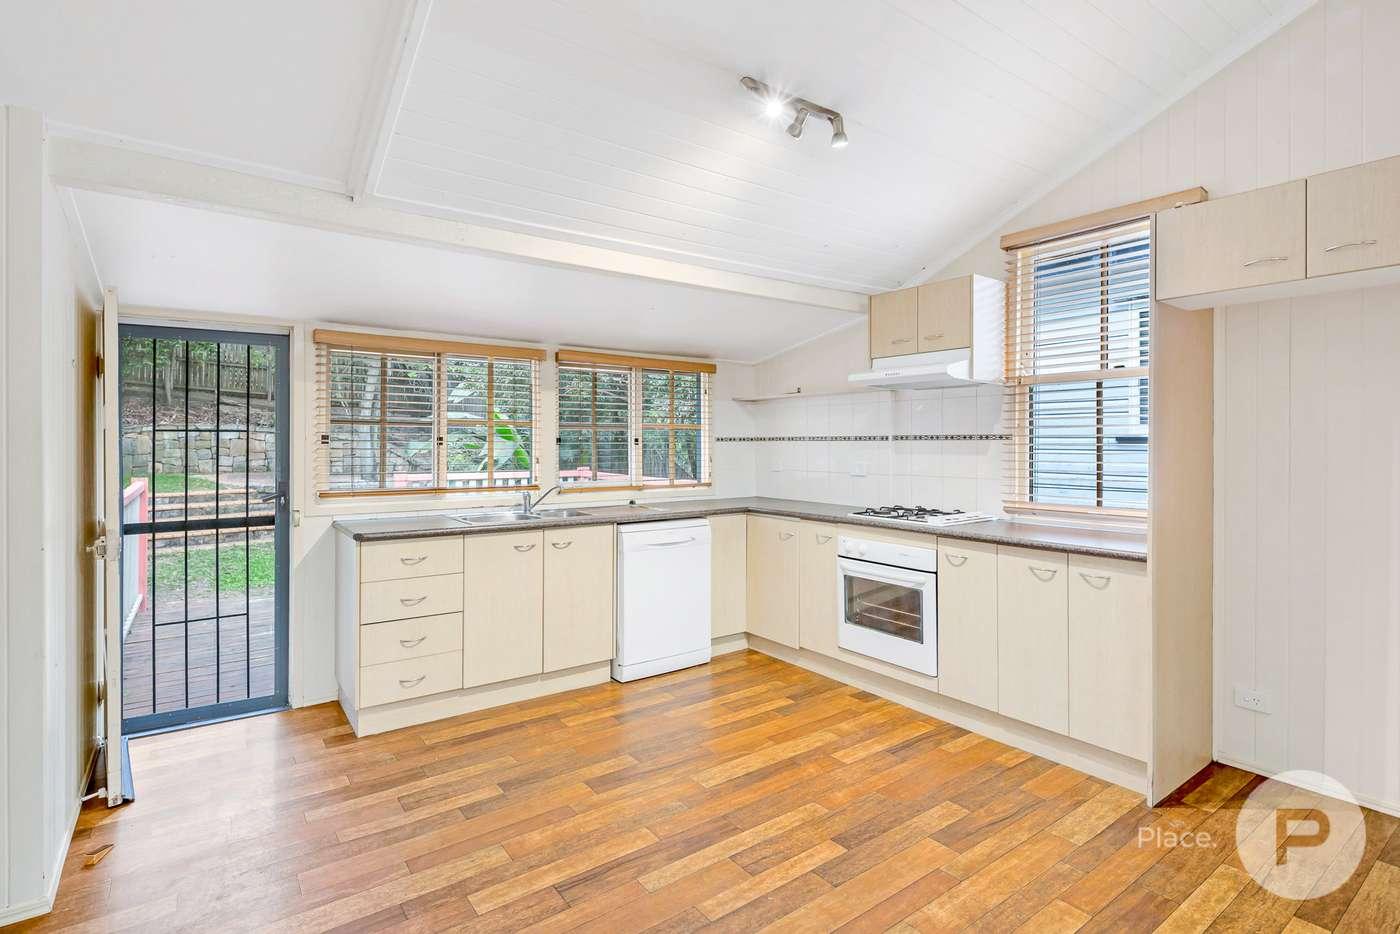 Sixth view of Homely house listing, 37 Stafford Street, Paddington QLD 4064